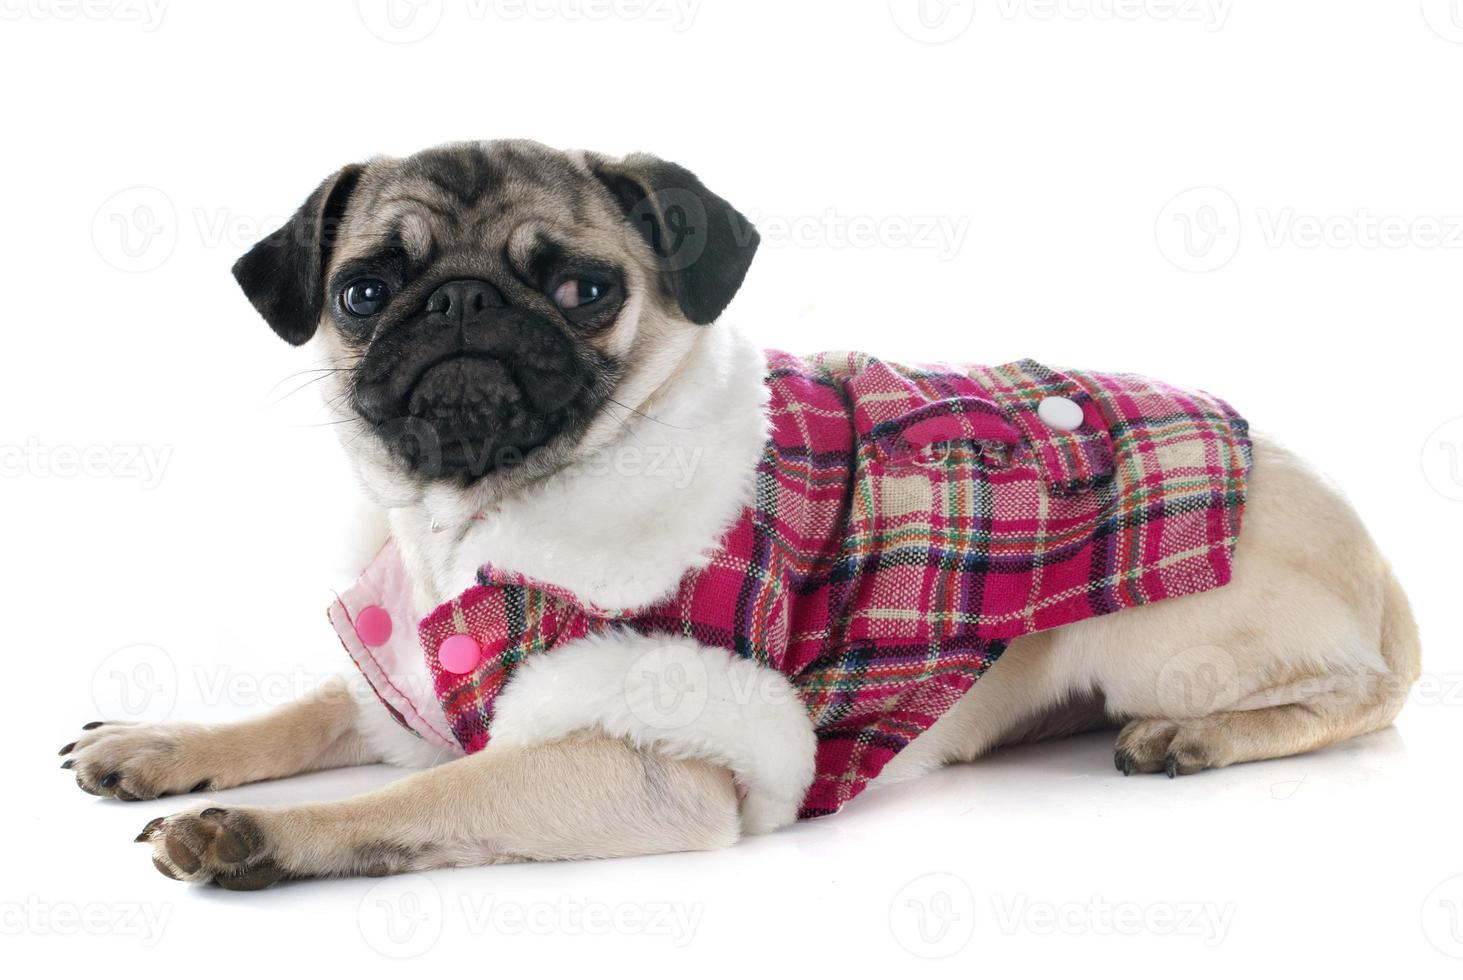 geklede puppy mopshond foto